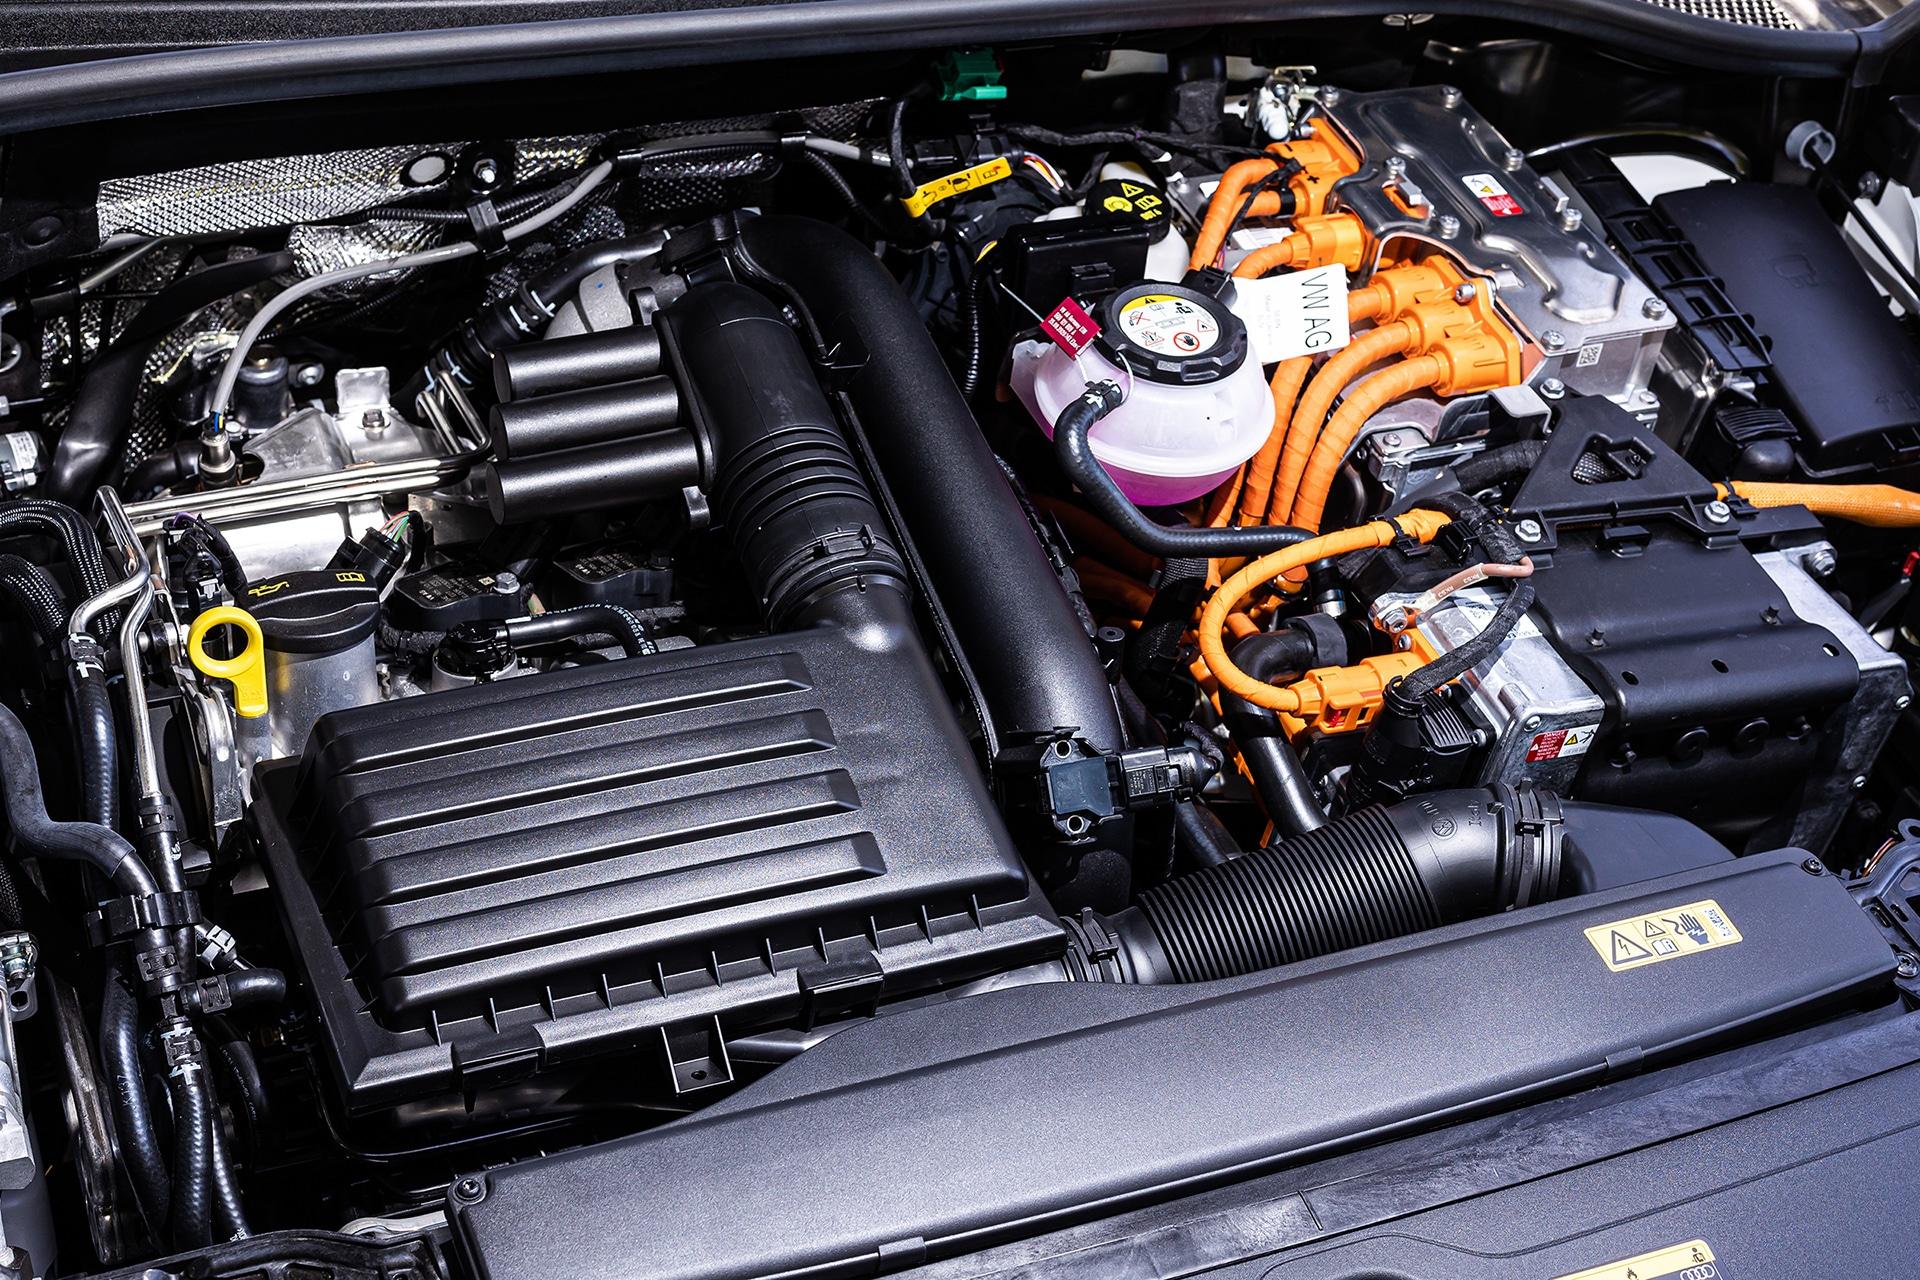 AUDI Q3 TFSI e 56 Αυτά είναι τα plug-in hybrid Audi Q3 TFSI e & Q3 Sportback TFSI e Audi, Audi Q3, Hybrid, plug-in hybrid, Q3, ειδήσεις, Νέα, υβριδικό